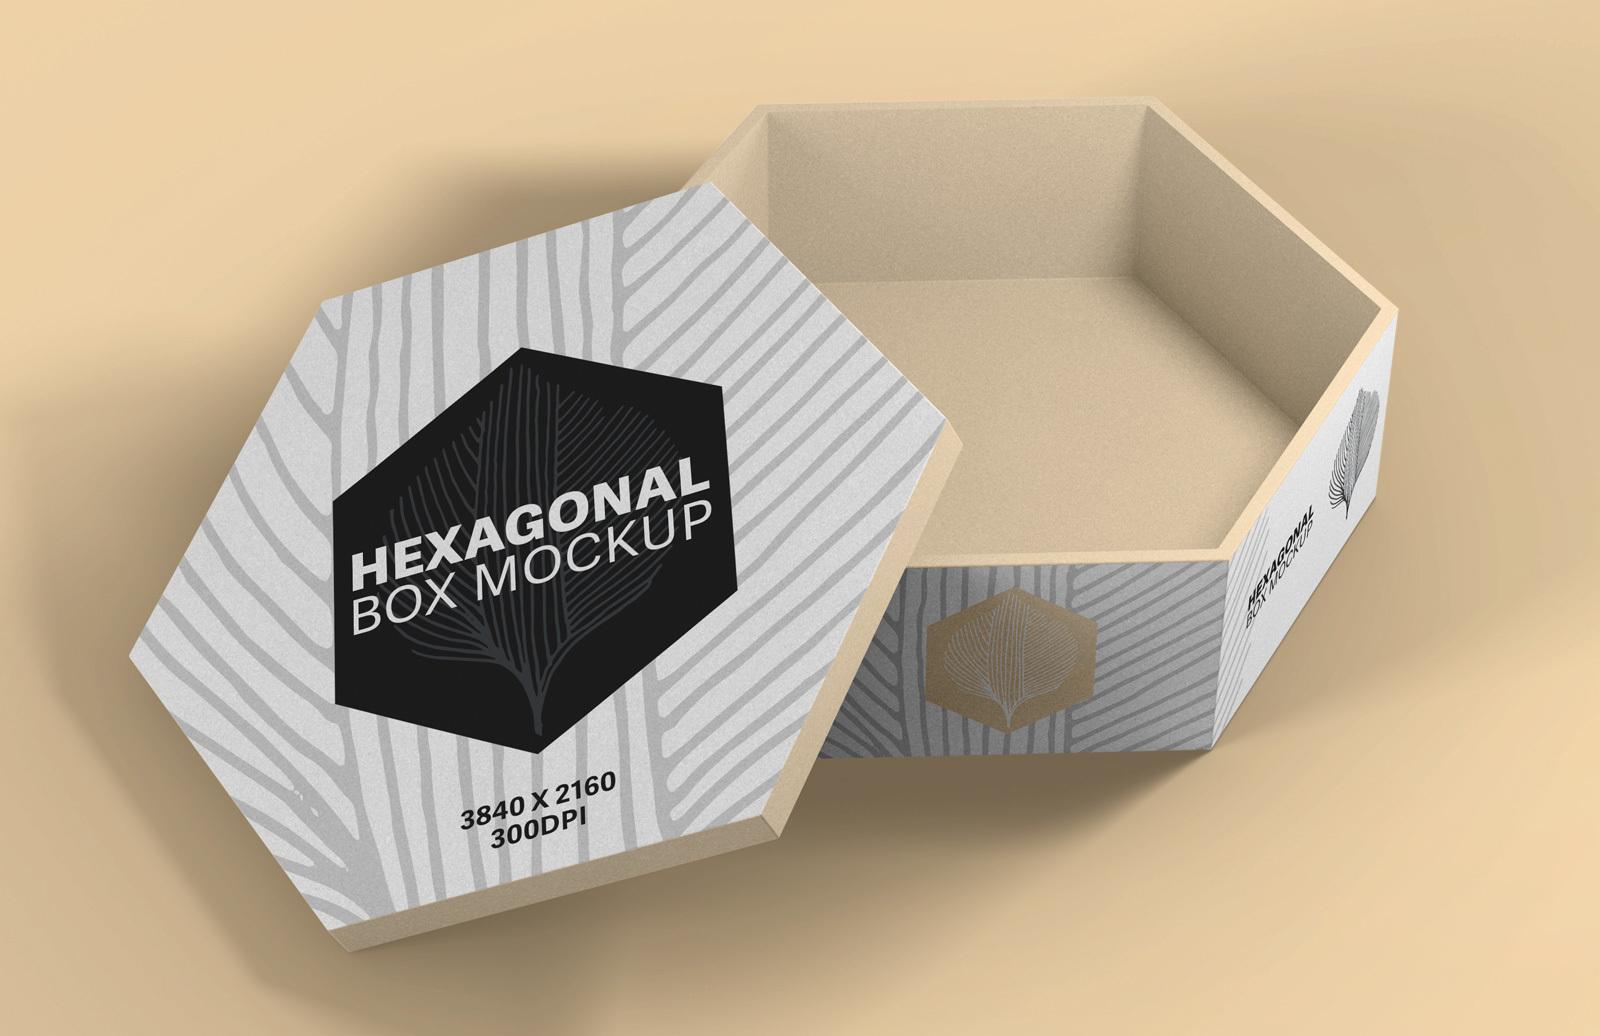 Hexagonal Box Mockup Preview 1